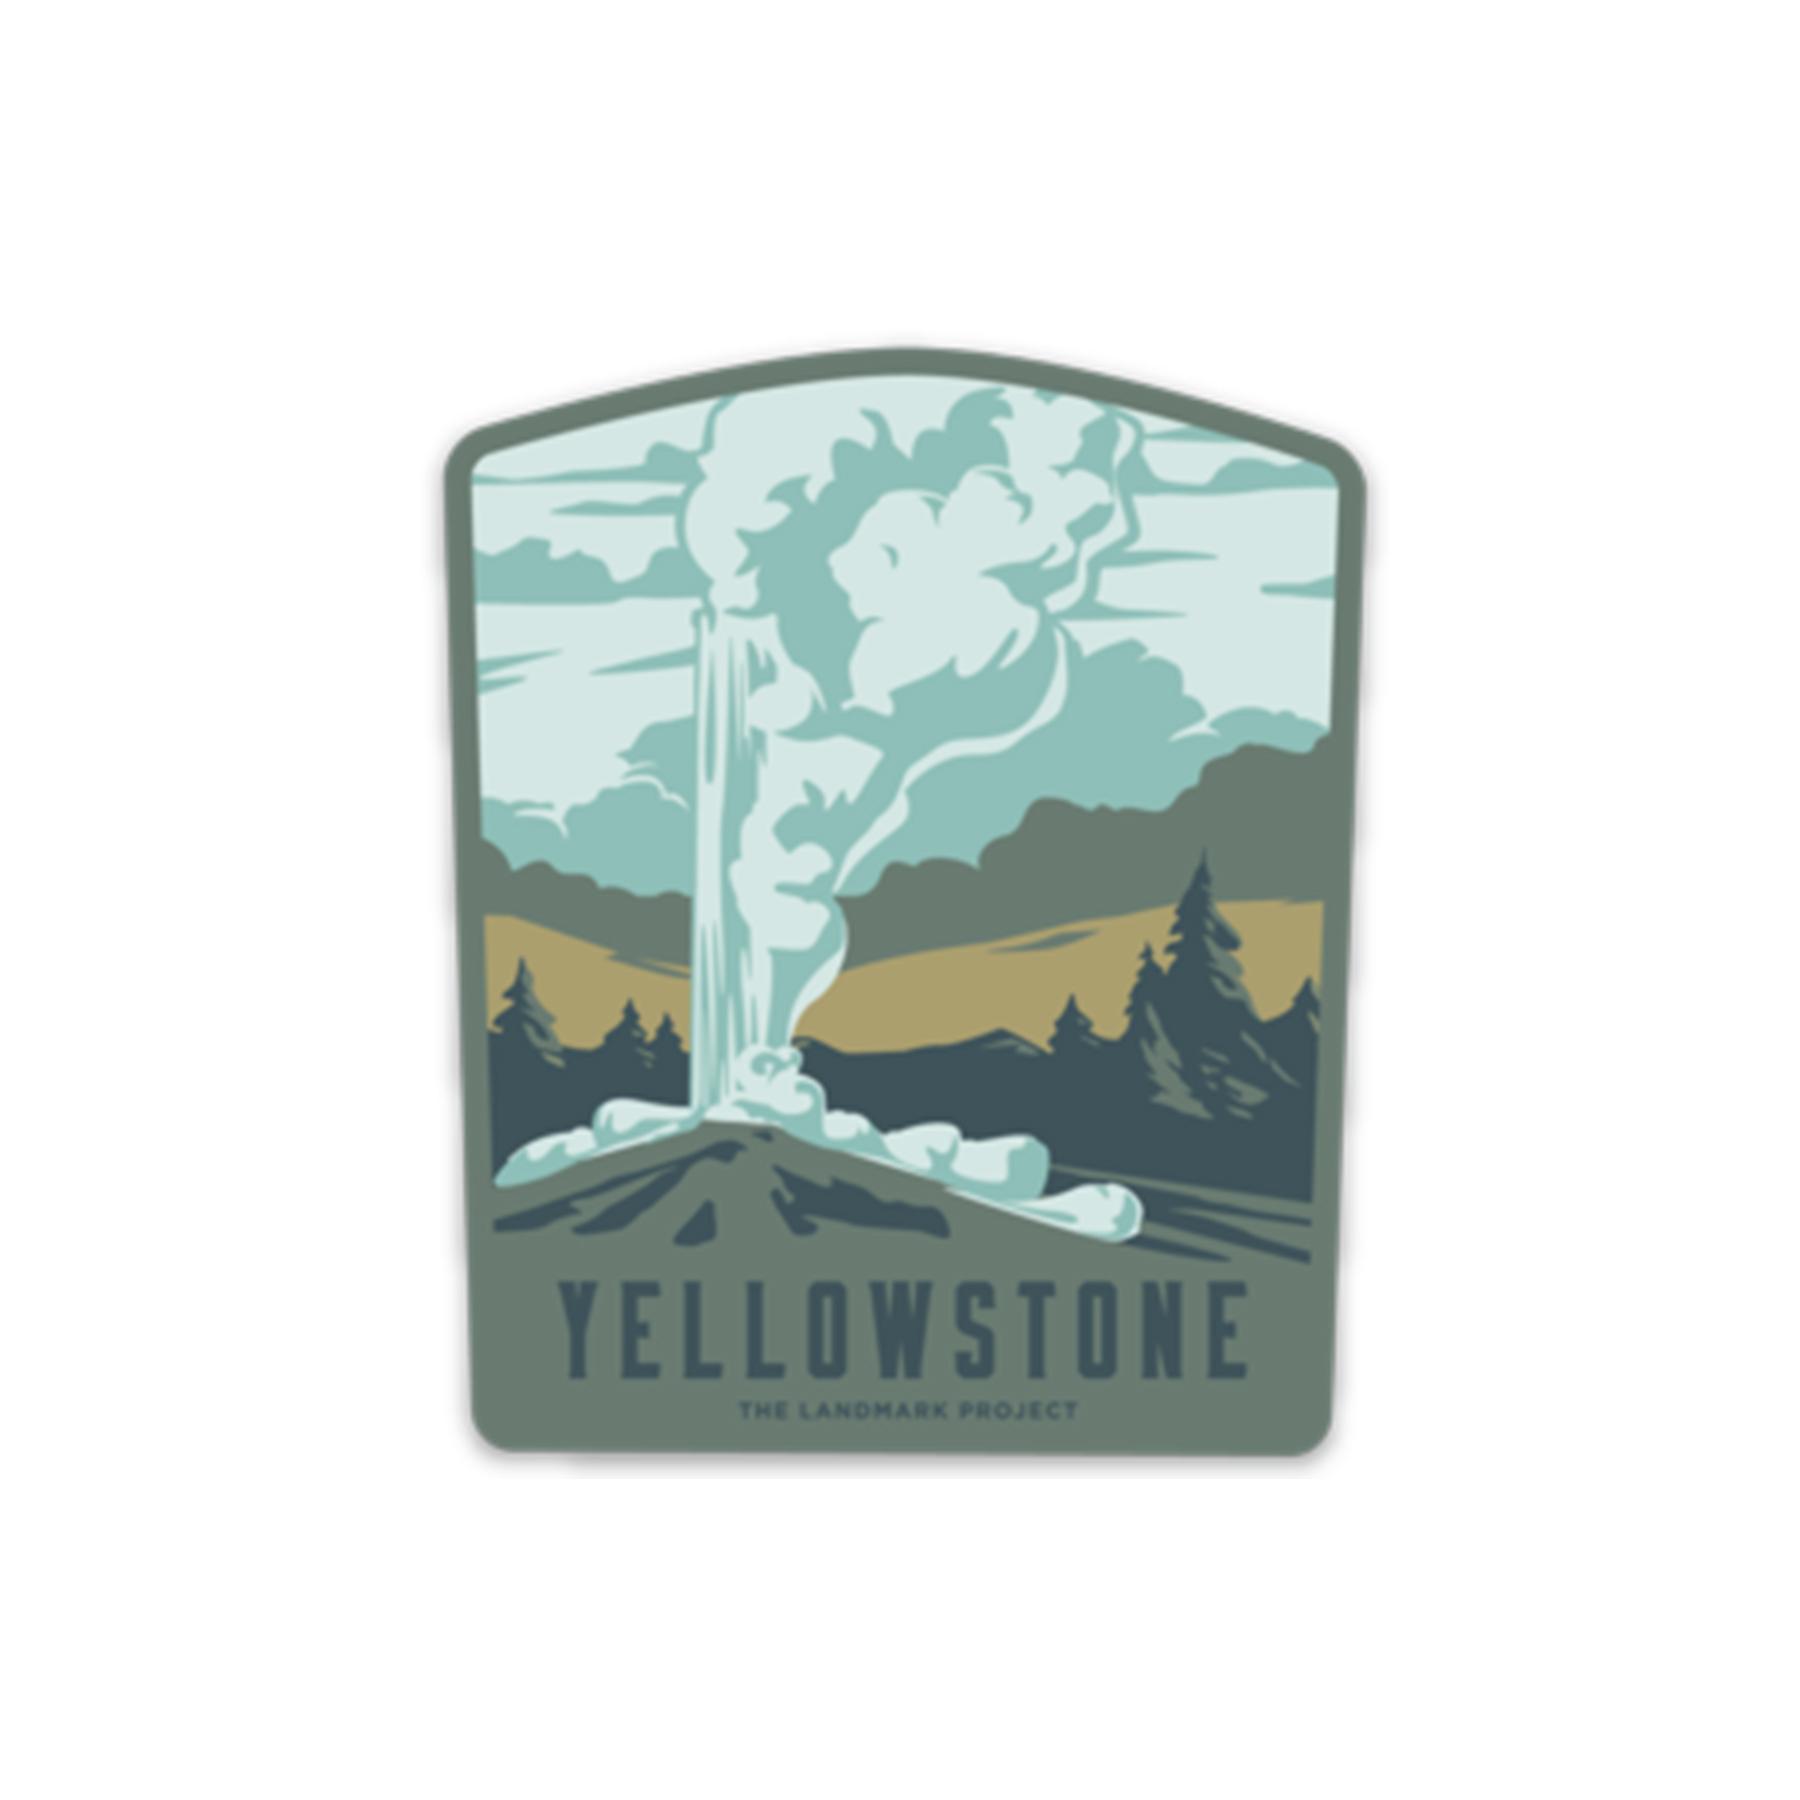 yellowstone-sticker.jpg